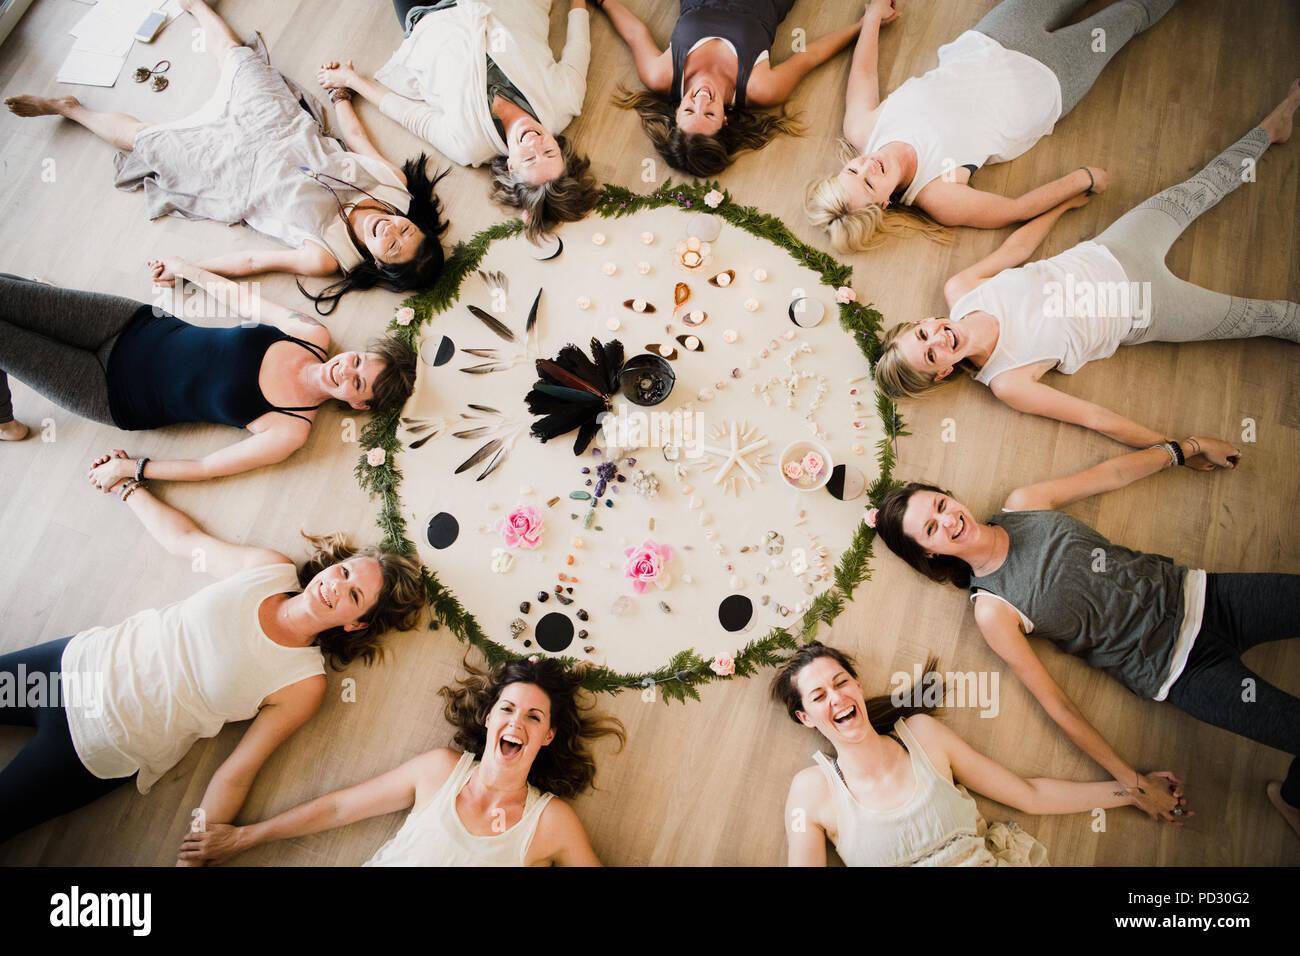 Women around circle in yoga retreat - Stock Image